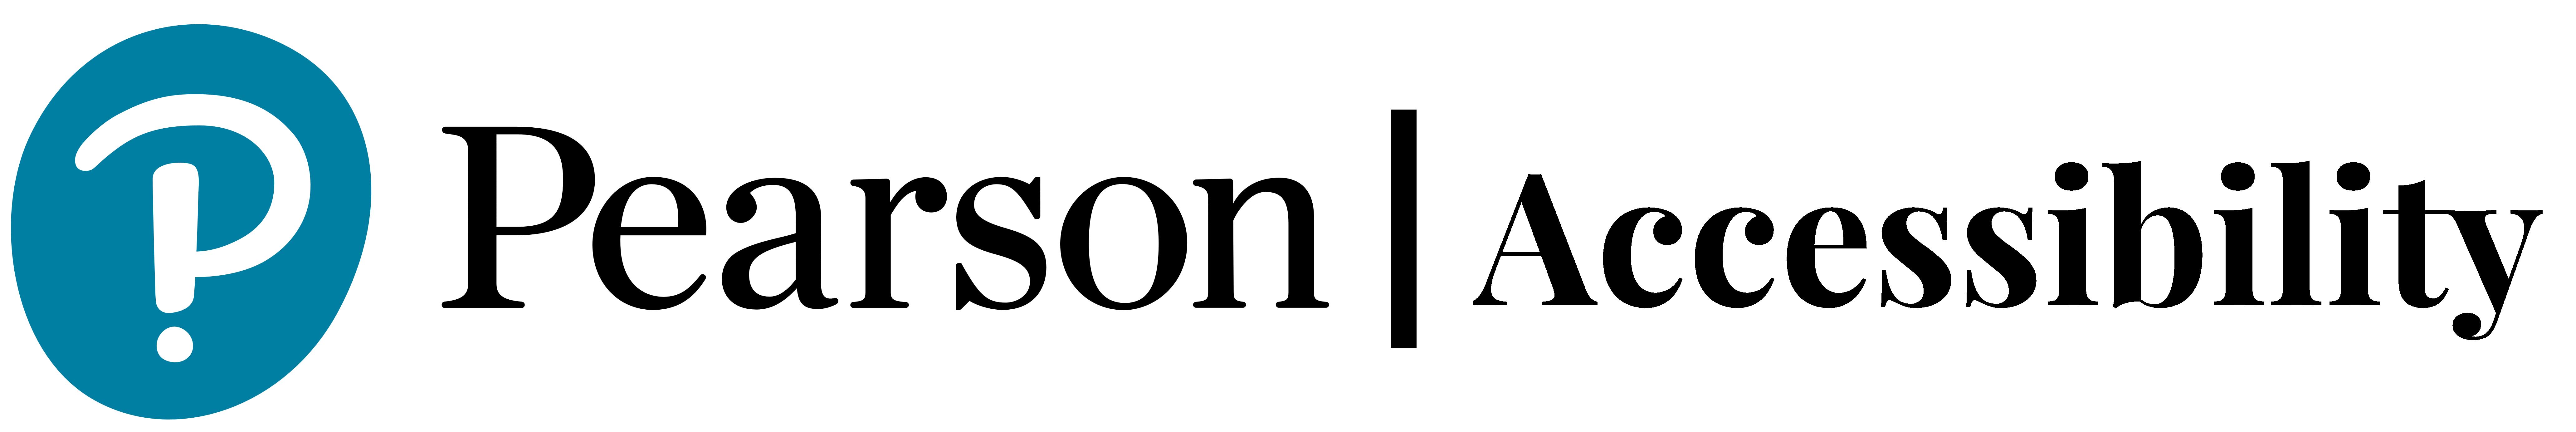 Pearson accessibility logo